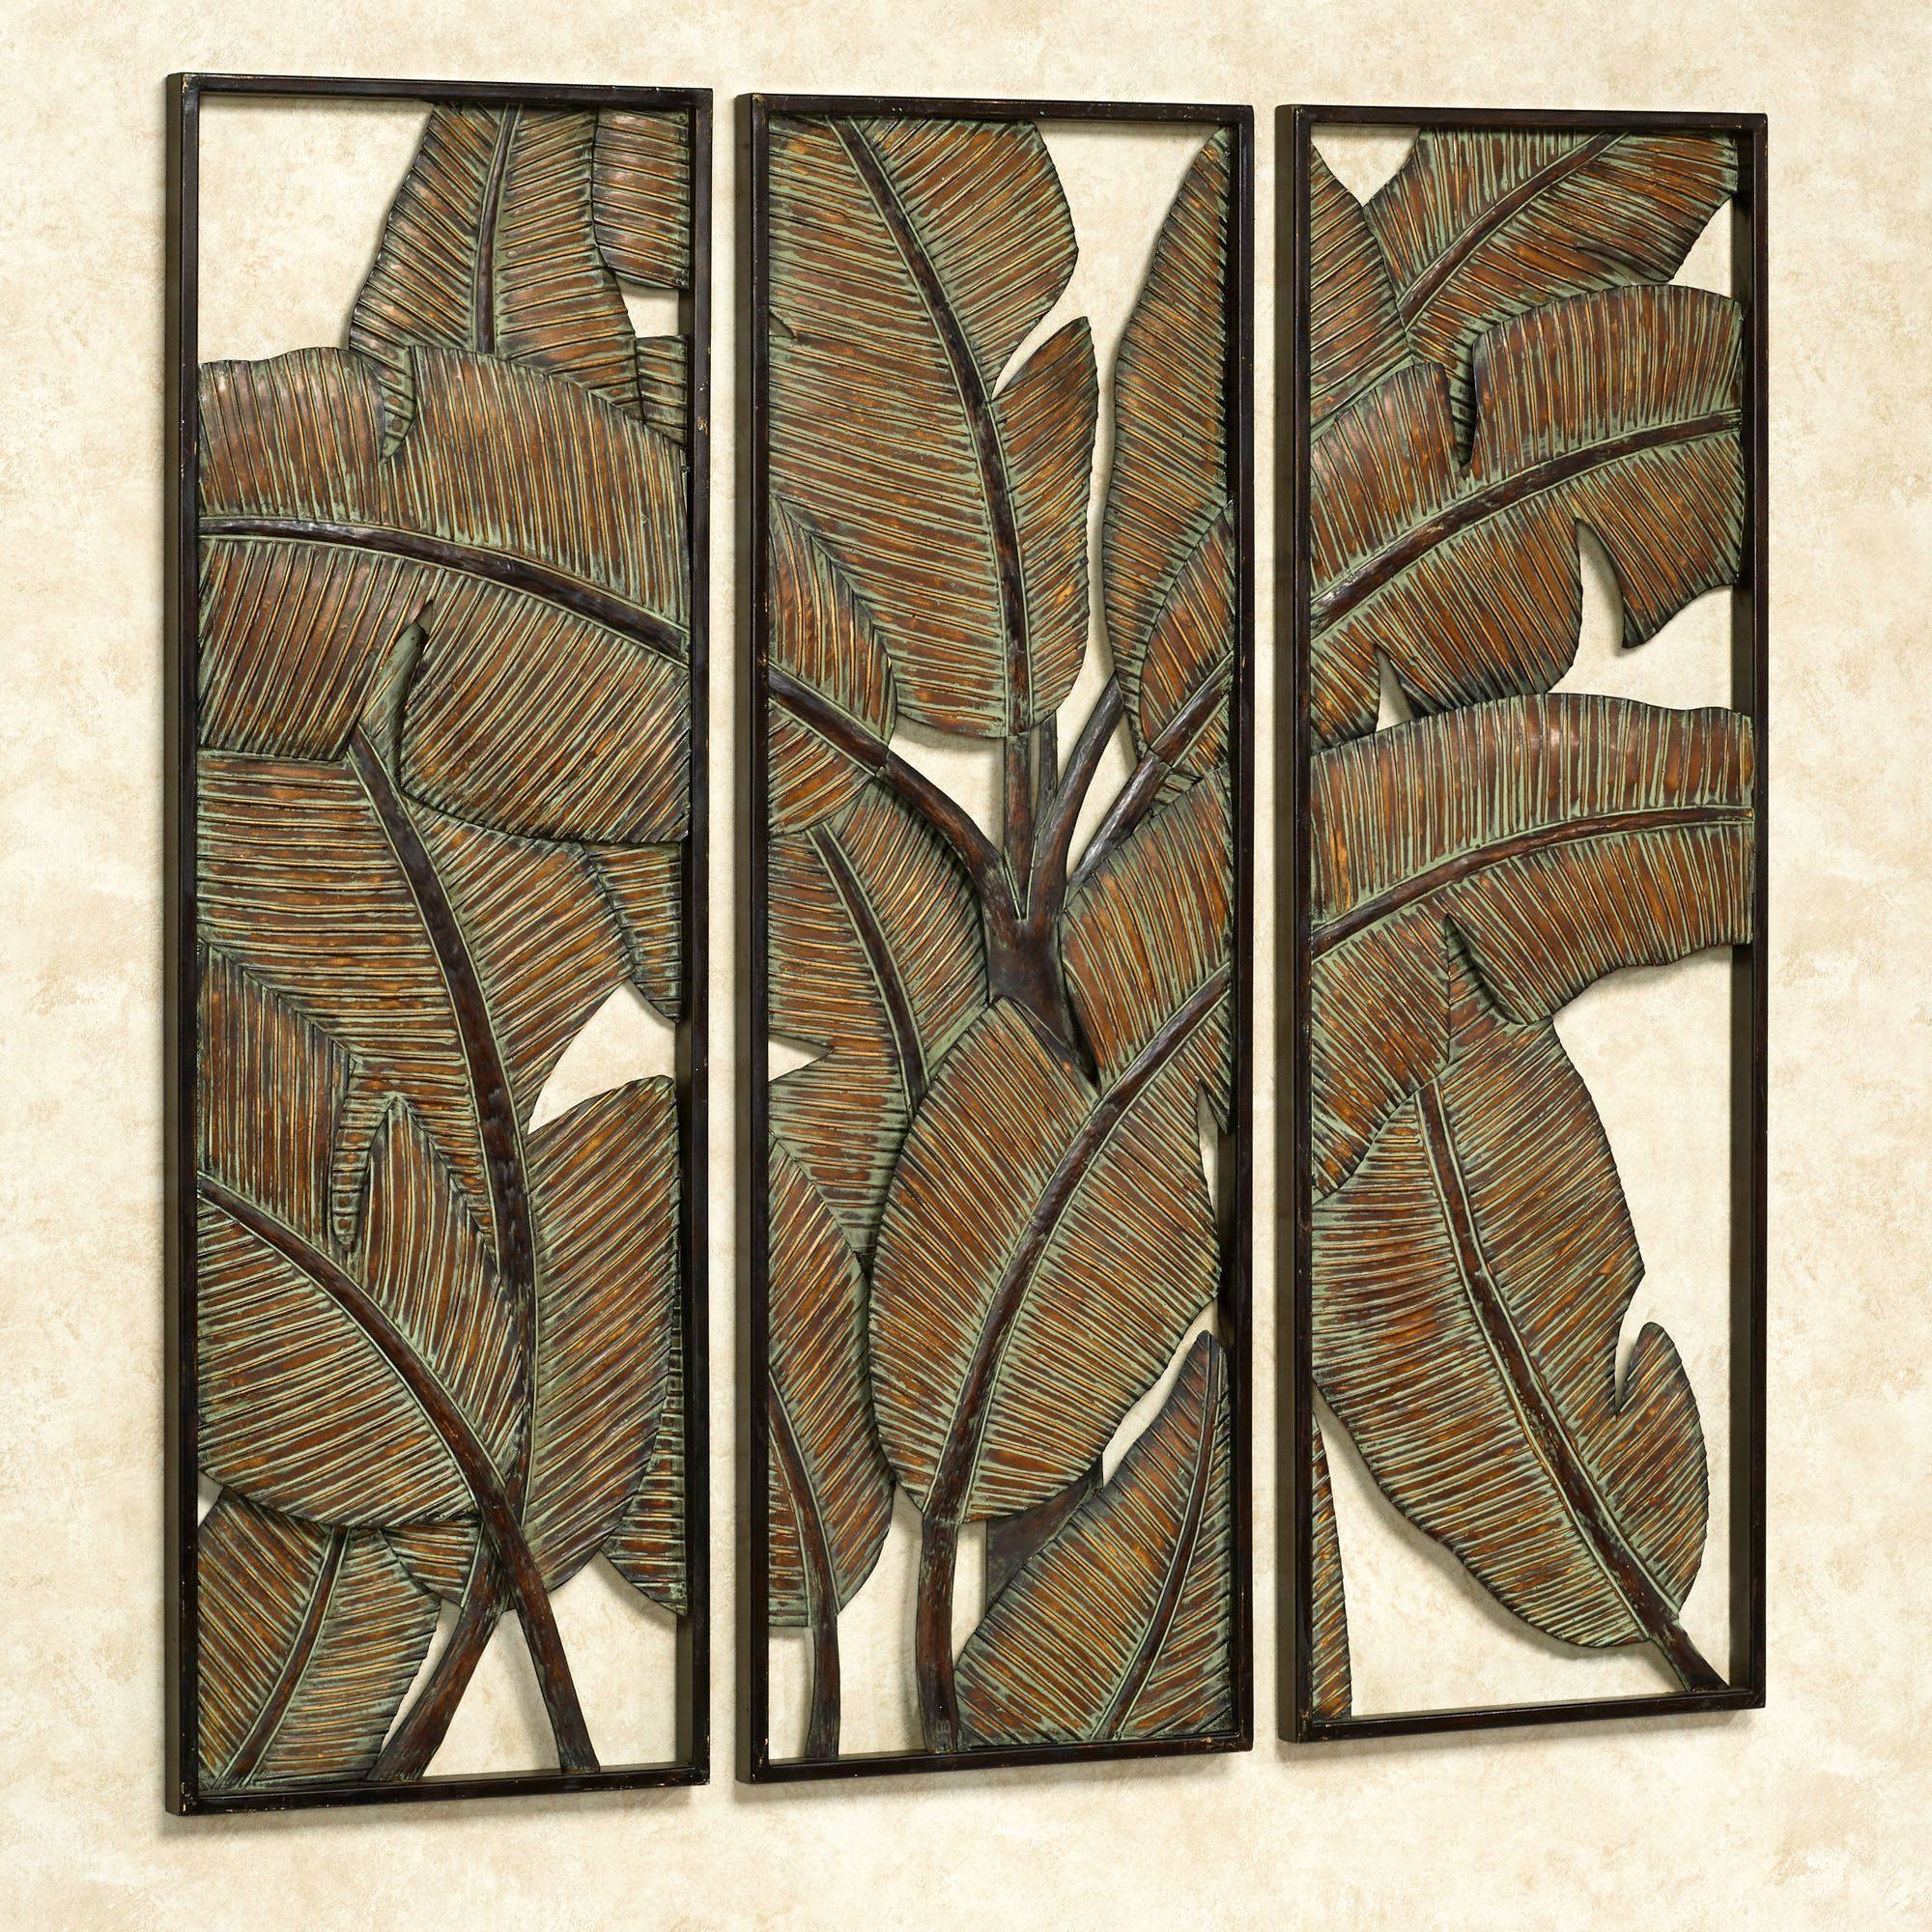 Kaylani Tropical Leaf Metal Wall Art Panel Set Throughout Latest Metal Wall Art Panels (View 7 of 20)